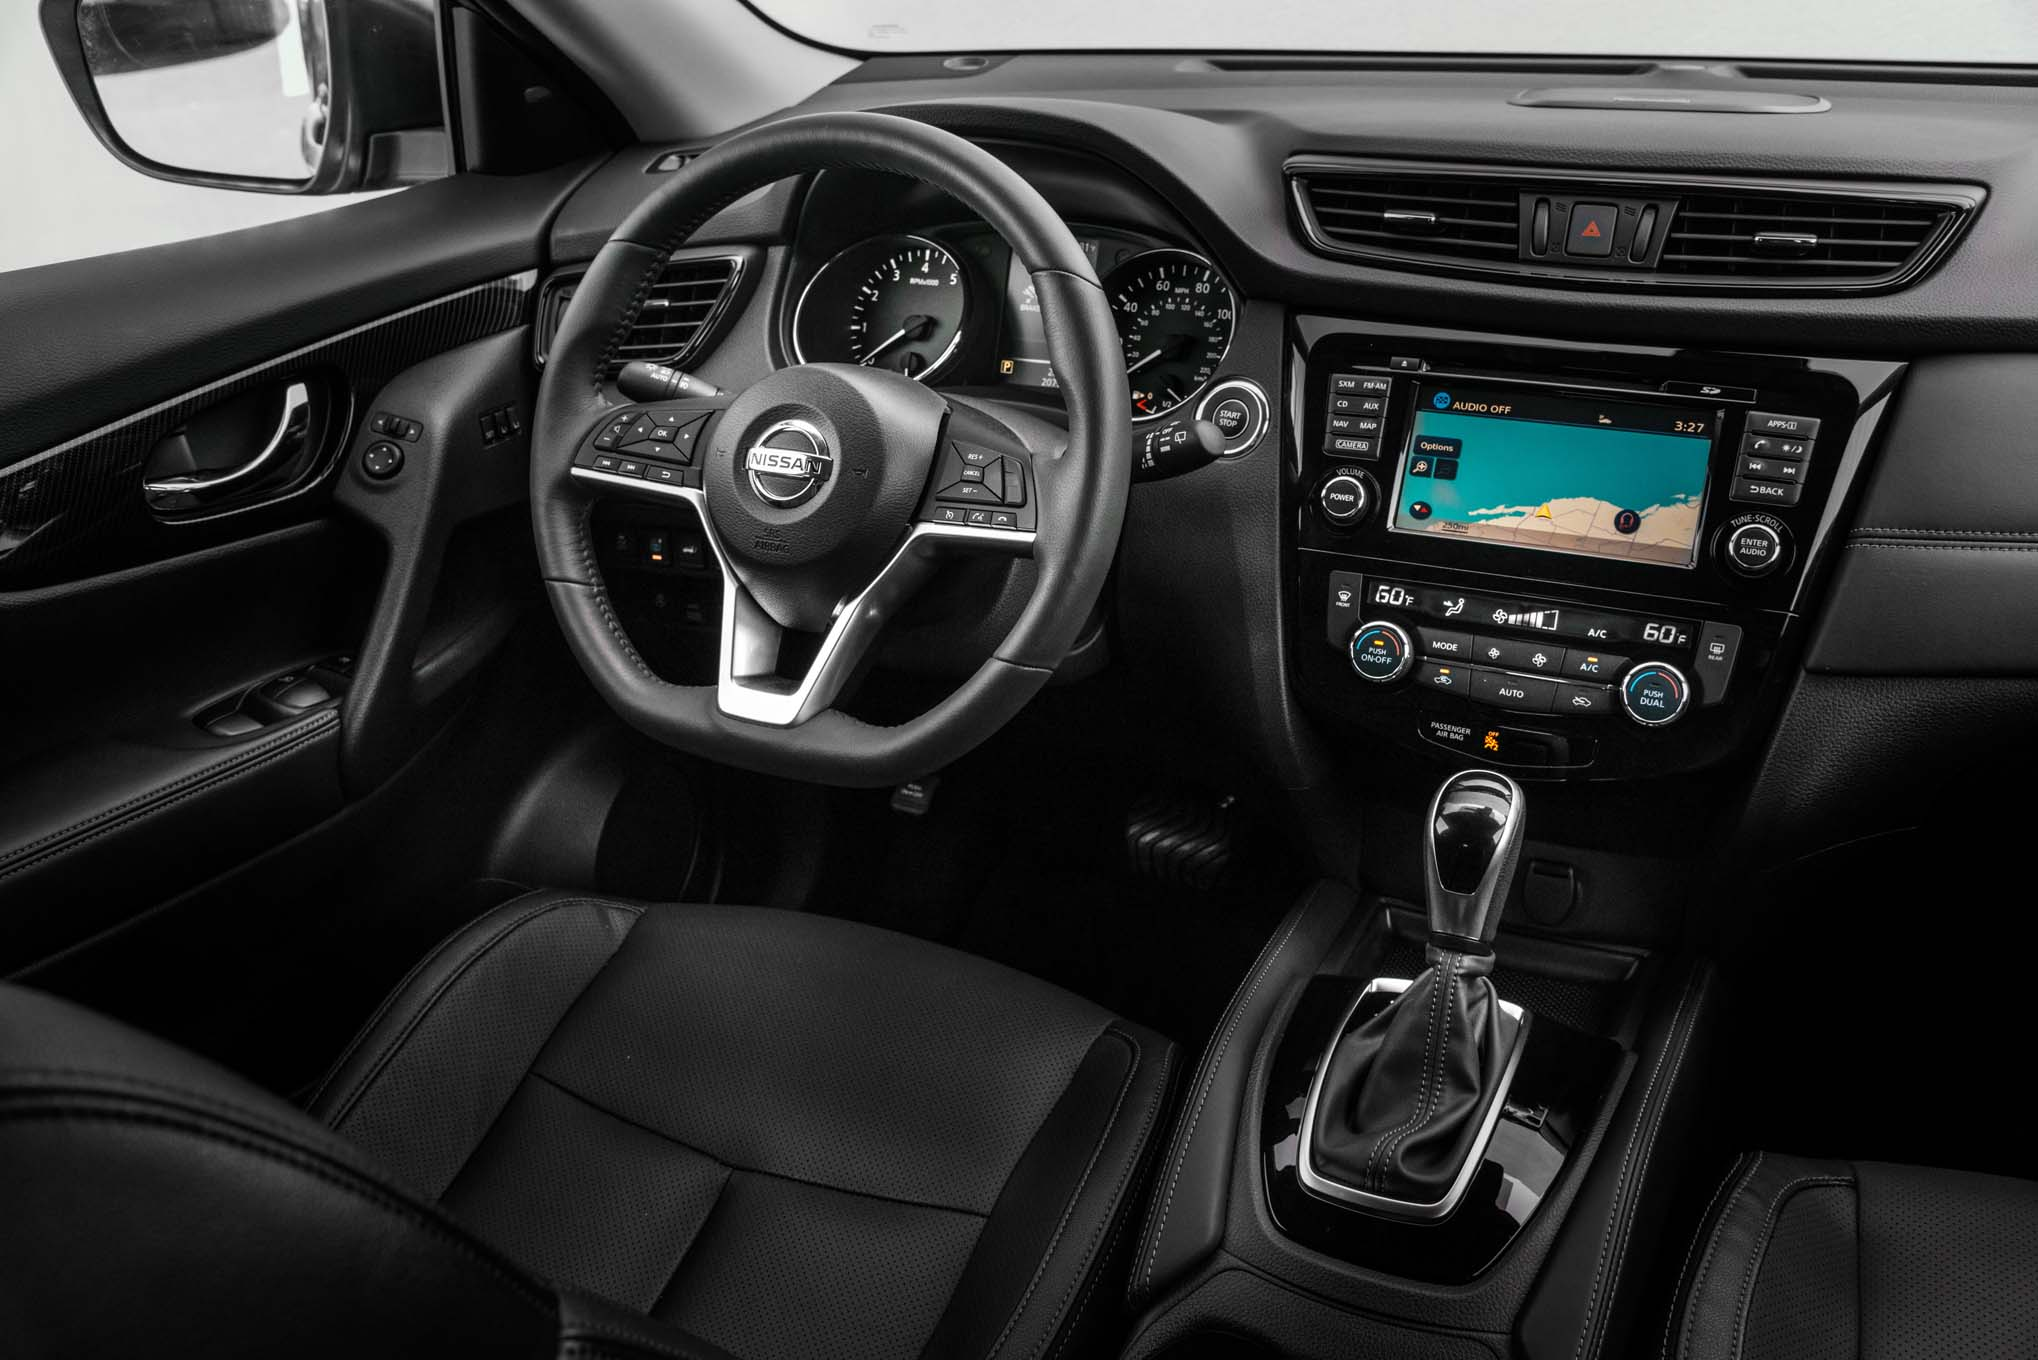 2017 Nissan Rogue Hybrid interior - Motor Trend en Español